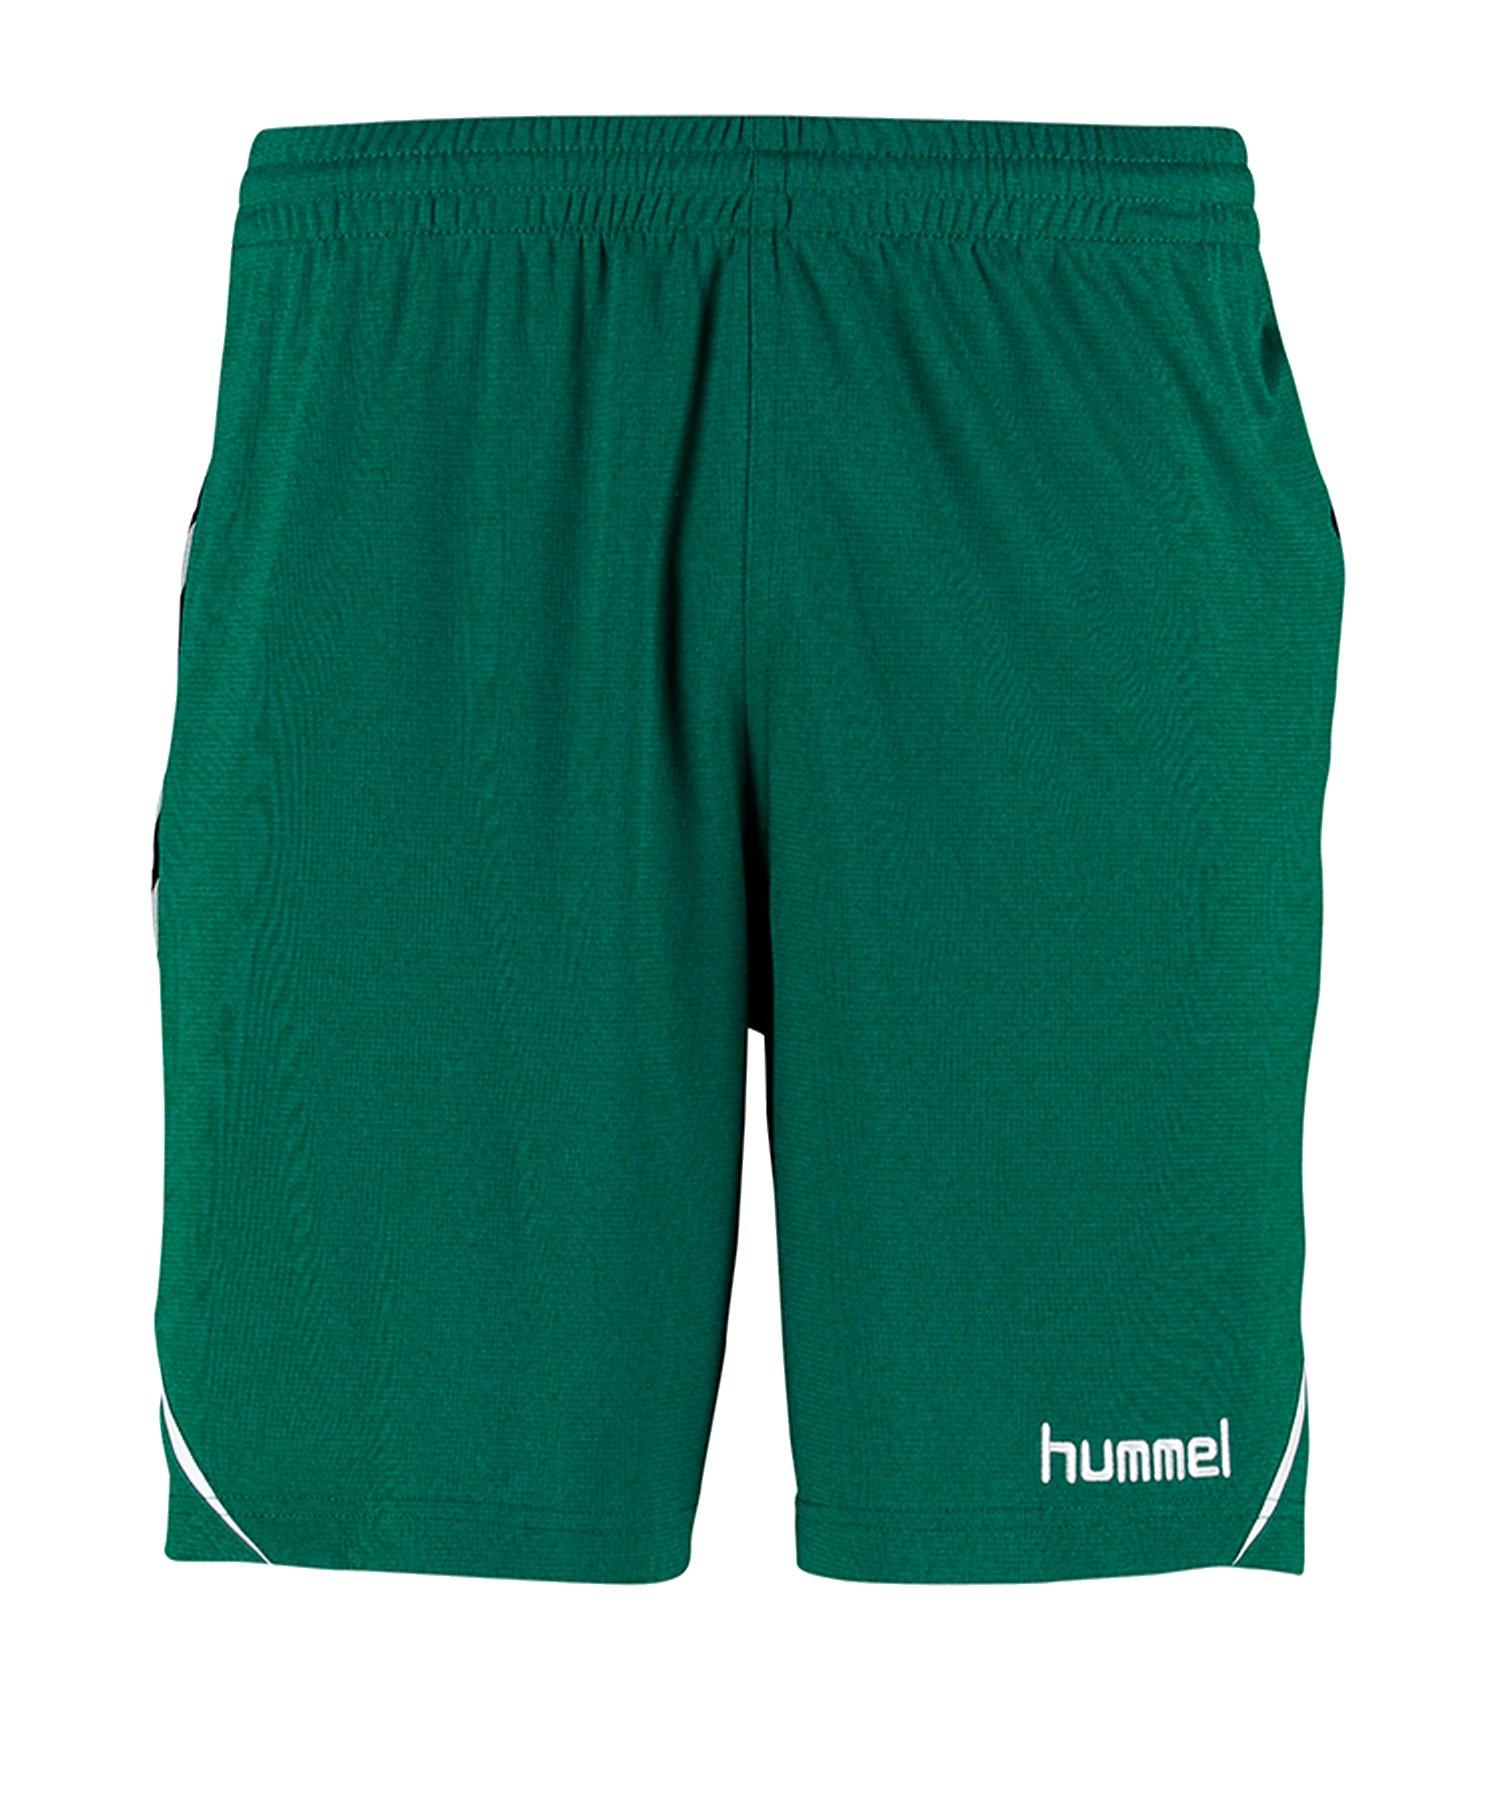 Hummel Authentic Charge Shorts Kids Grün F6140 - Gruen